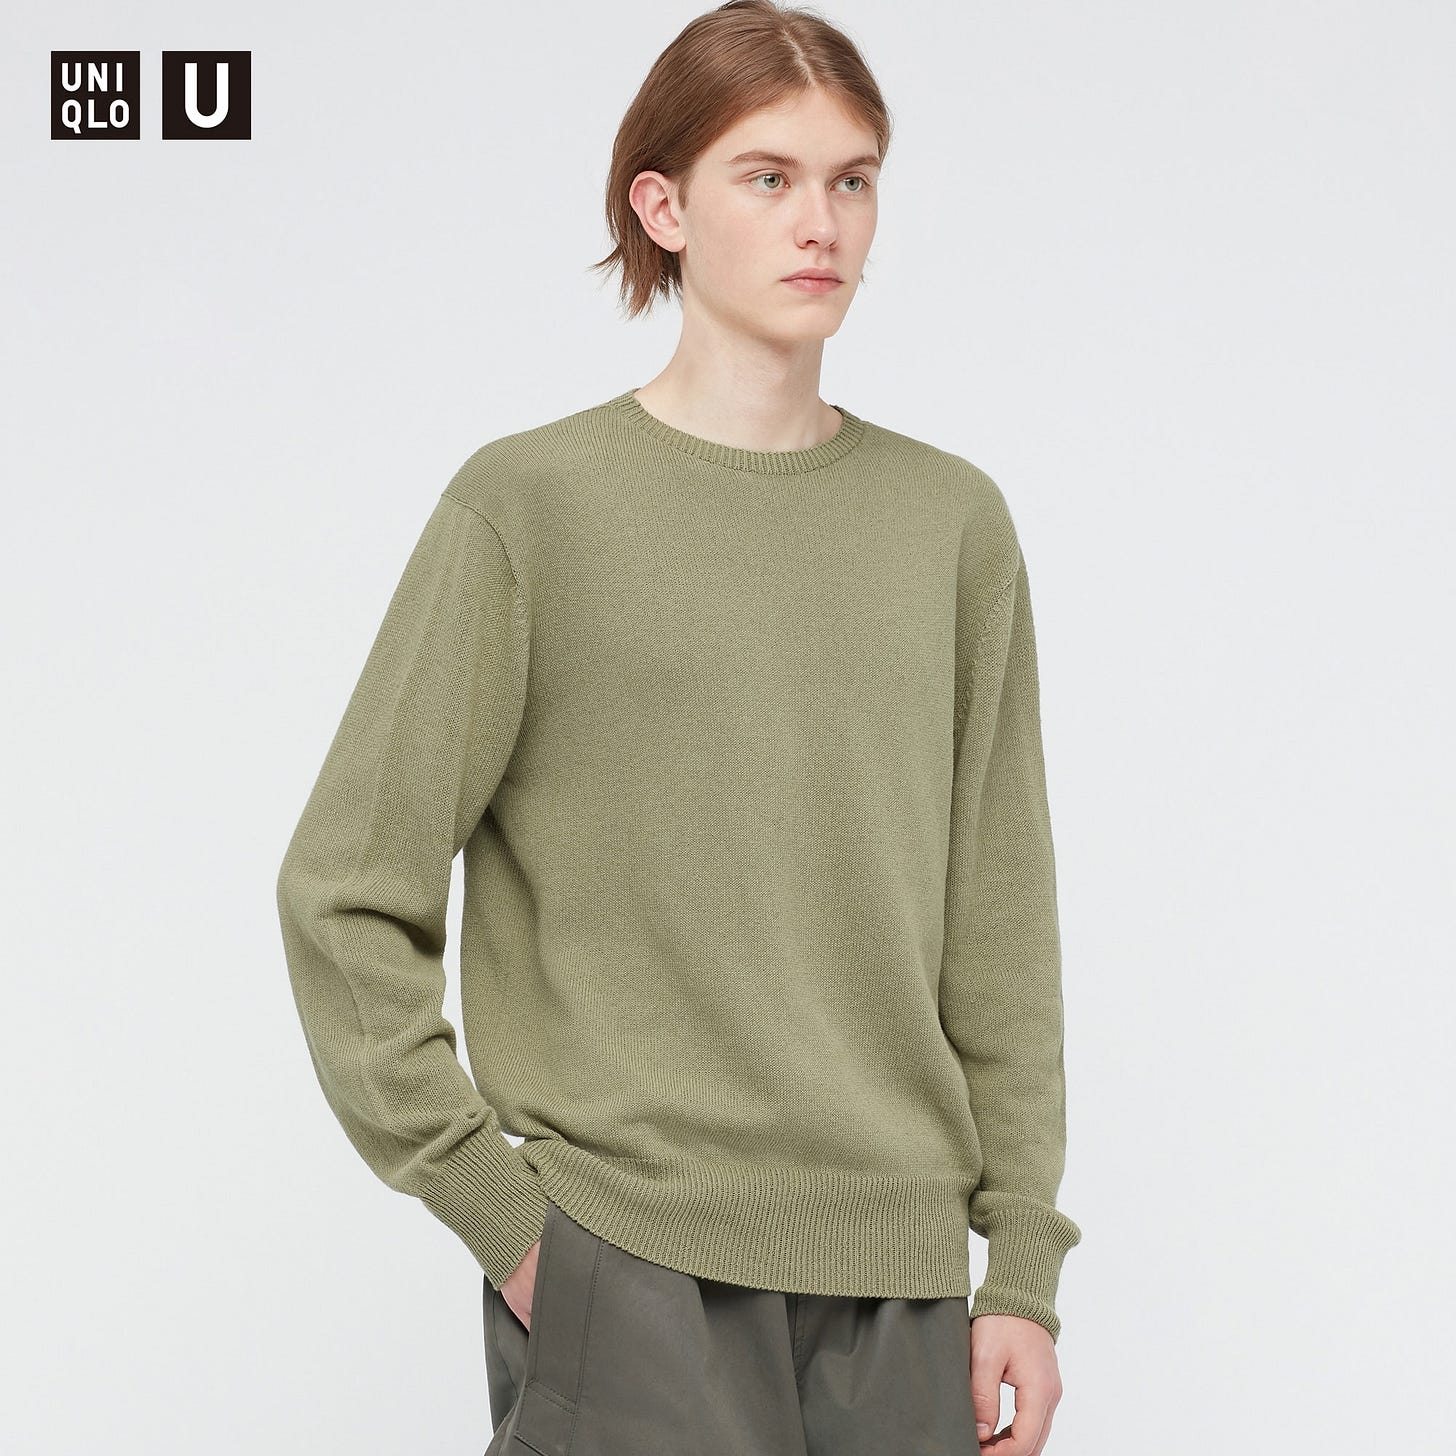 3D Crew Neck Long-Sleeve Sweater